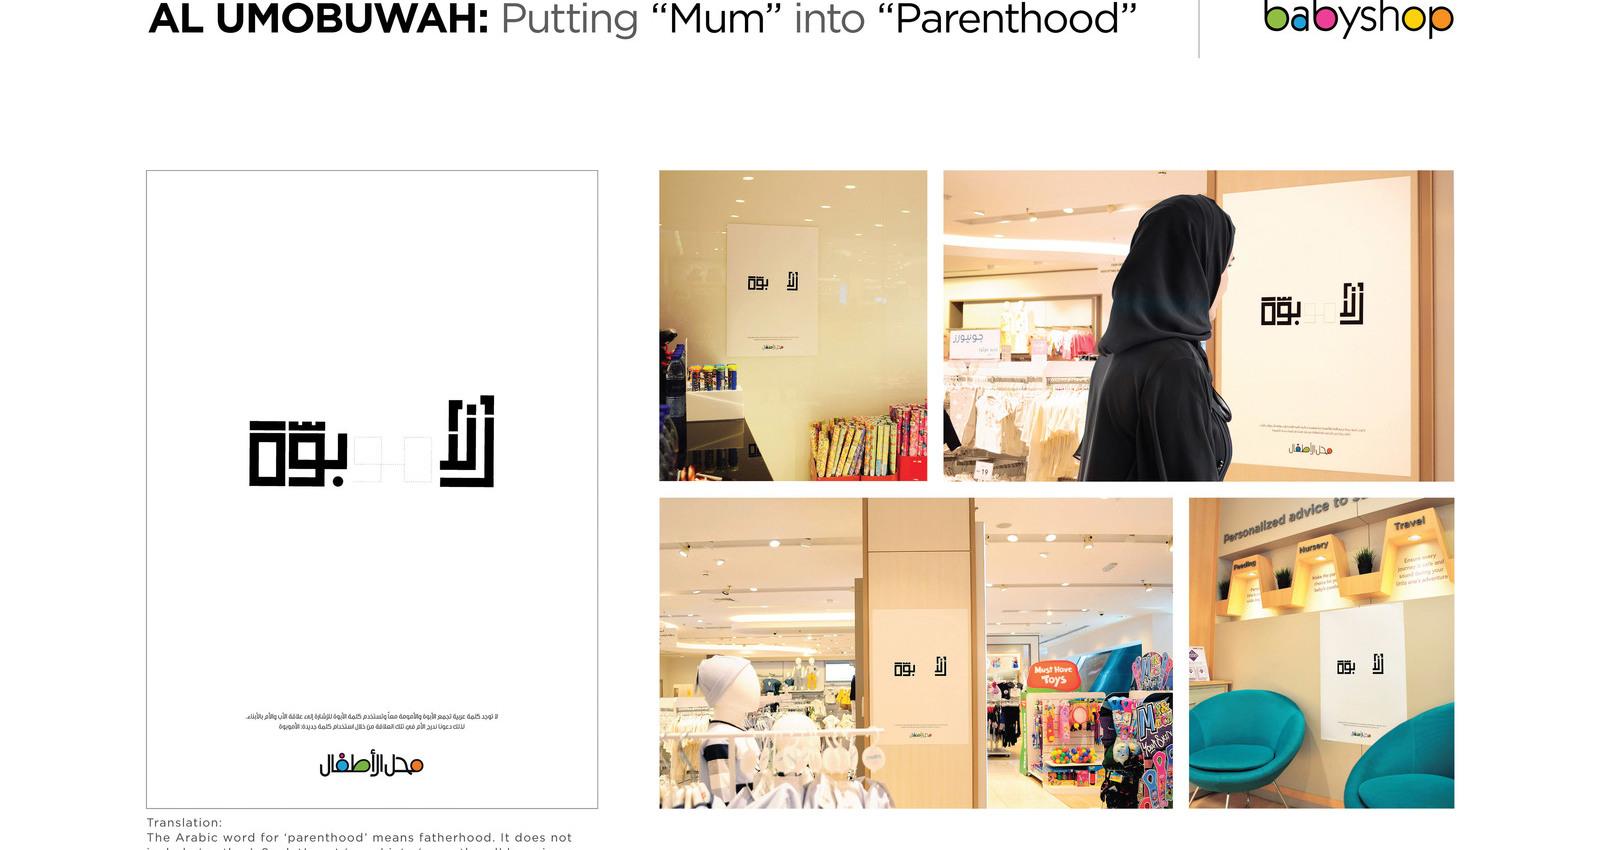 Al Umobuwah: Putting